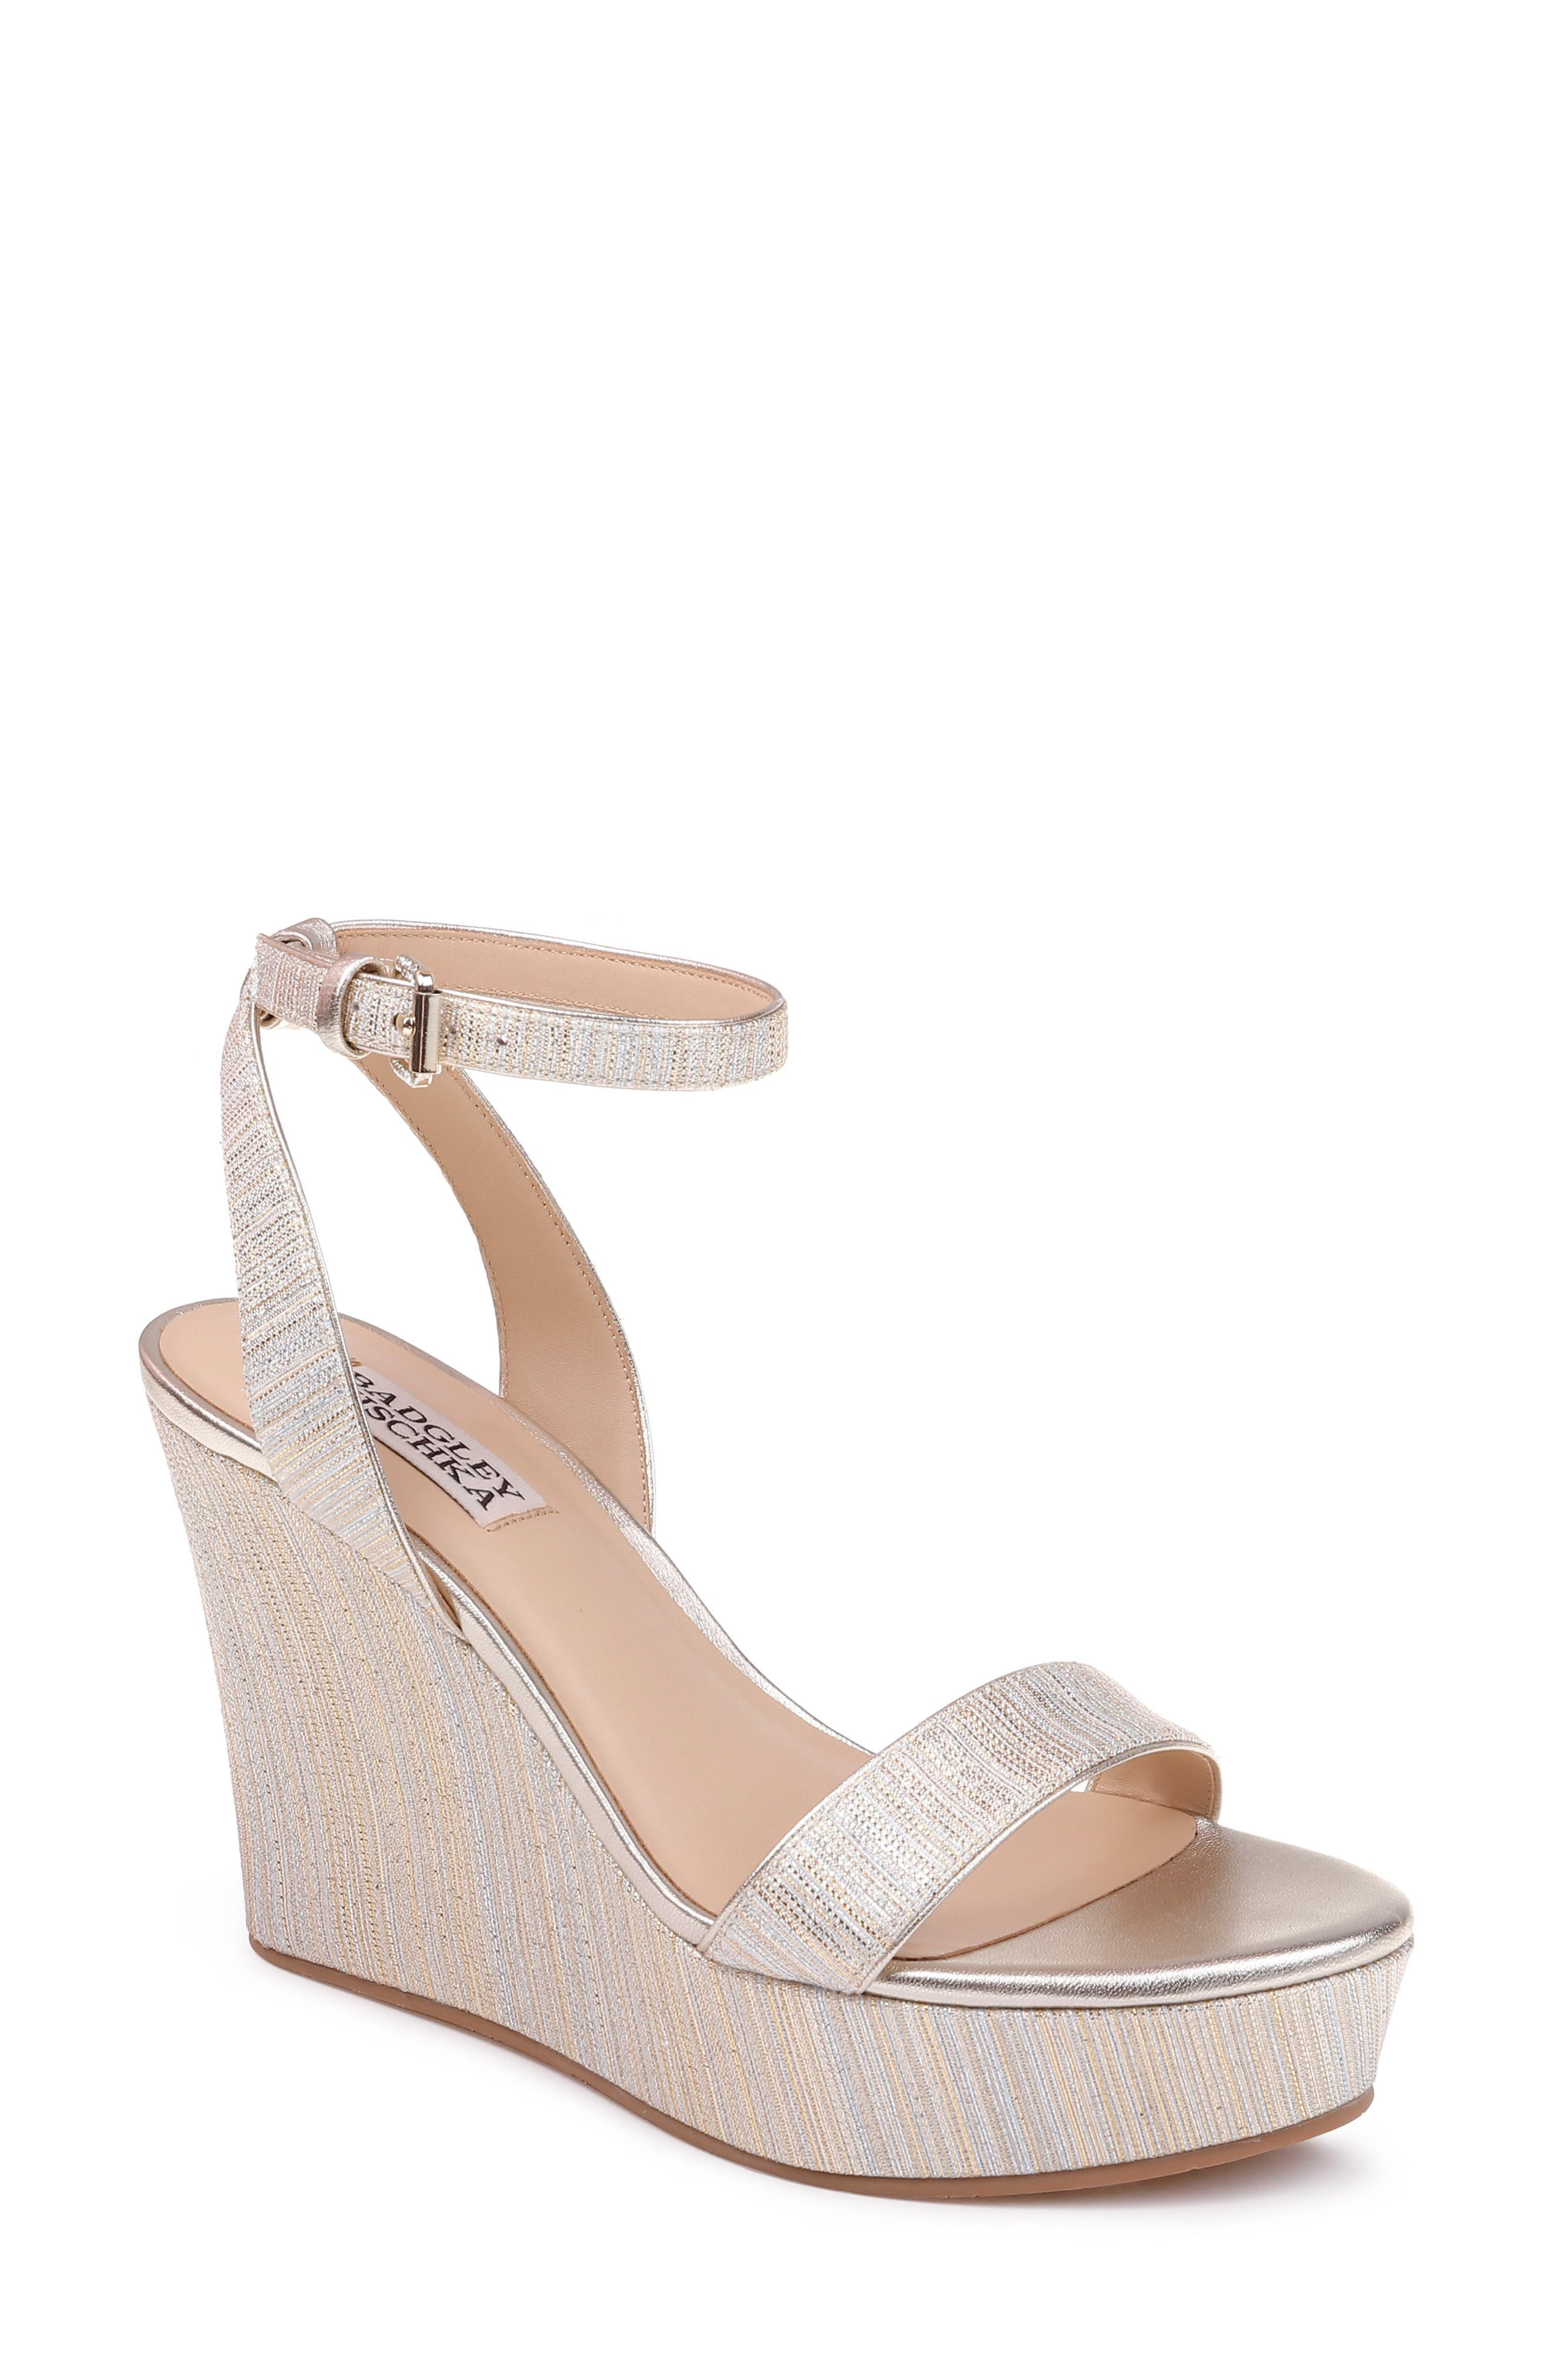 6ebfb389197 Women s Badgley Mischka Collection Wedge Sandals